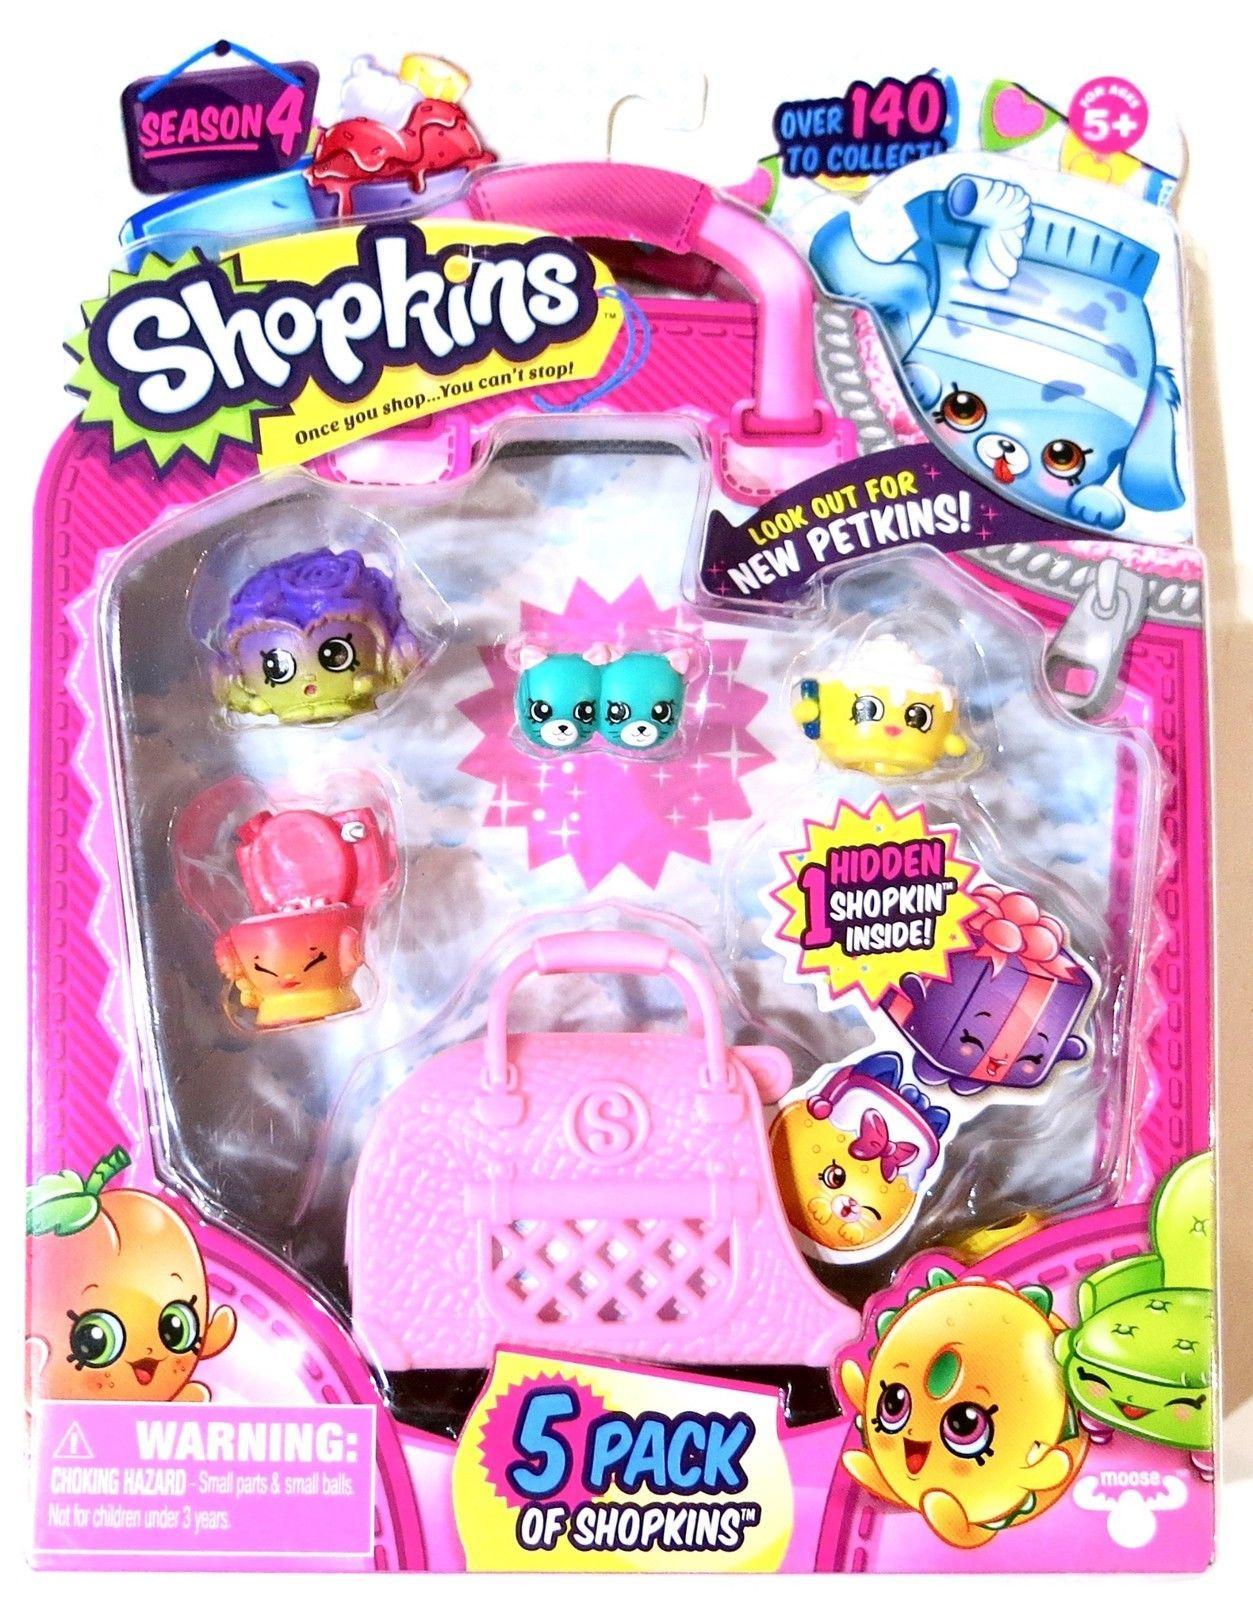 Shopkins season 4 5 pack shopkins shopkins season 4 - Shopkins pics ...